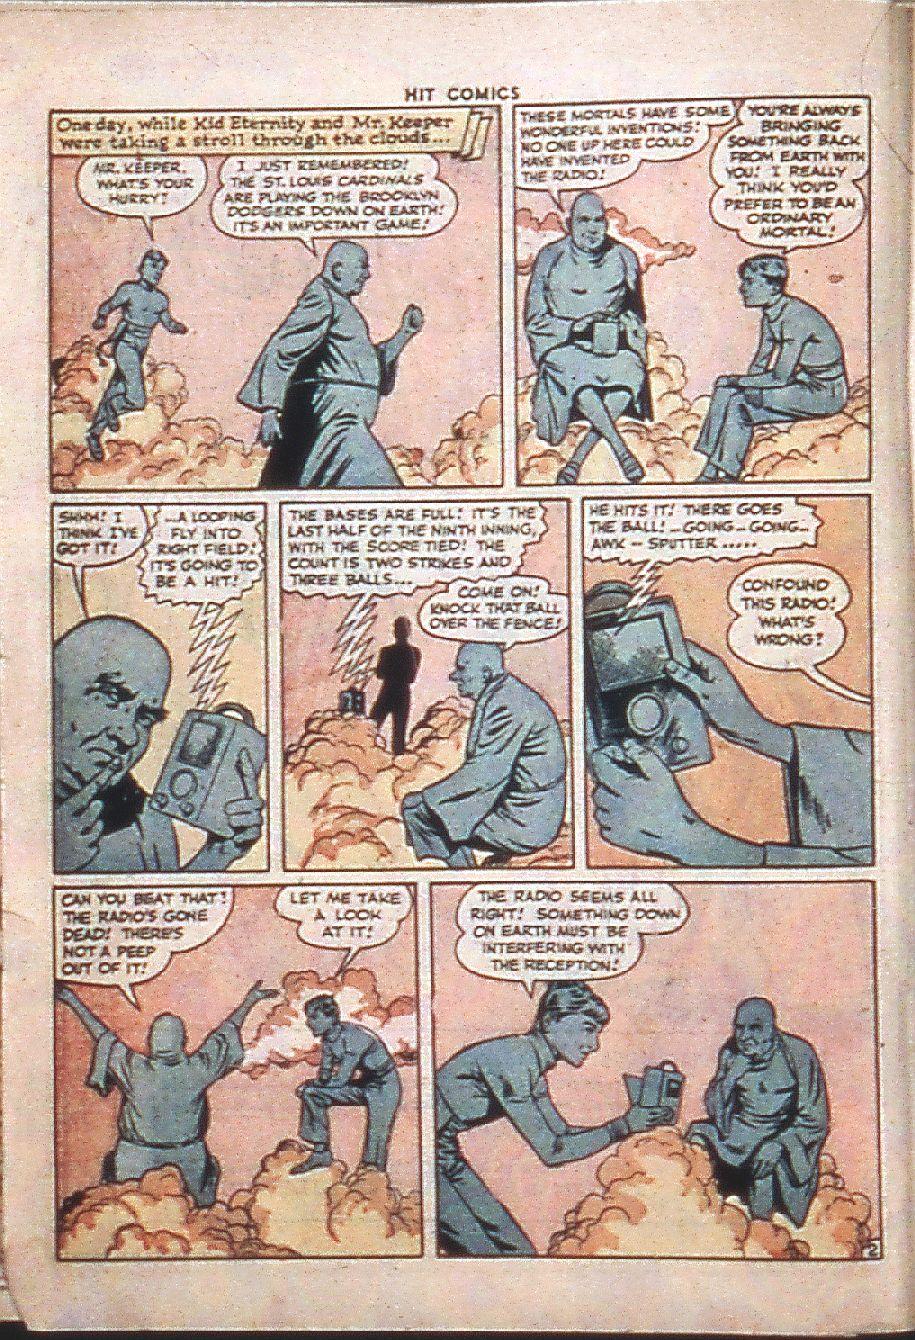 Read online Hit Comics comic -  Issue #37 - 4